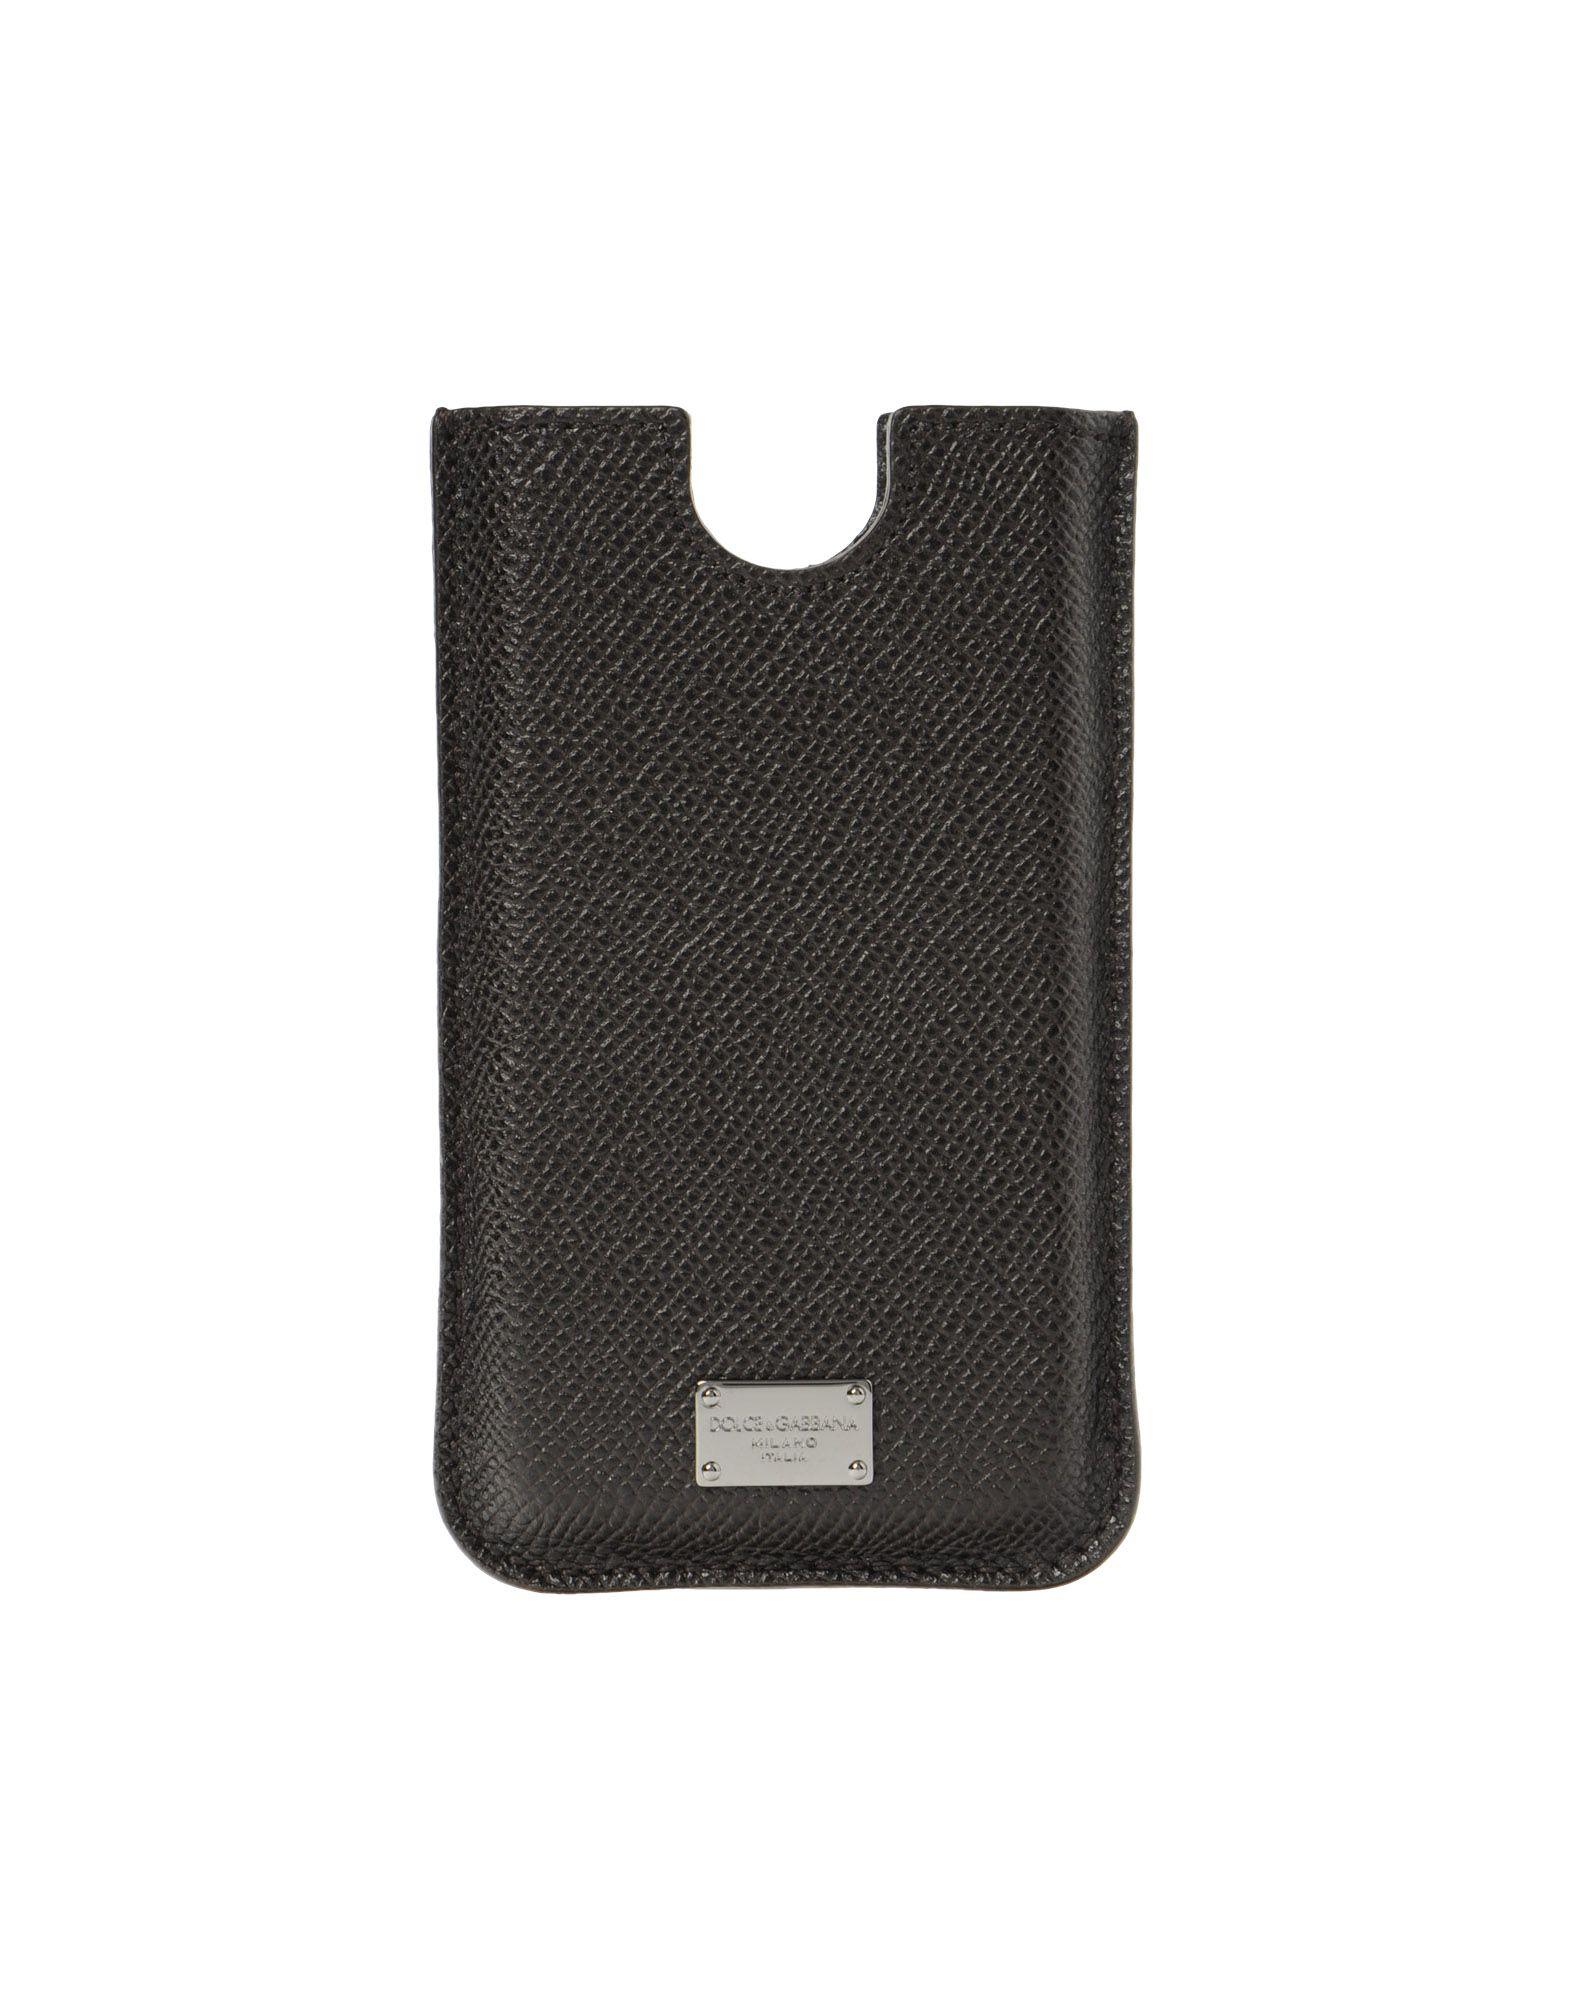 DOLCE & GABBANA Чехол для телефона чехол накладка iphone 5 5s силикон dolce gabbana paris hilton 401351